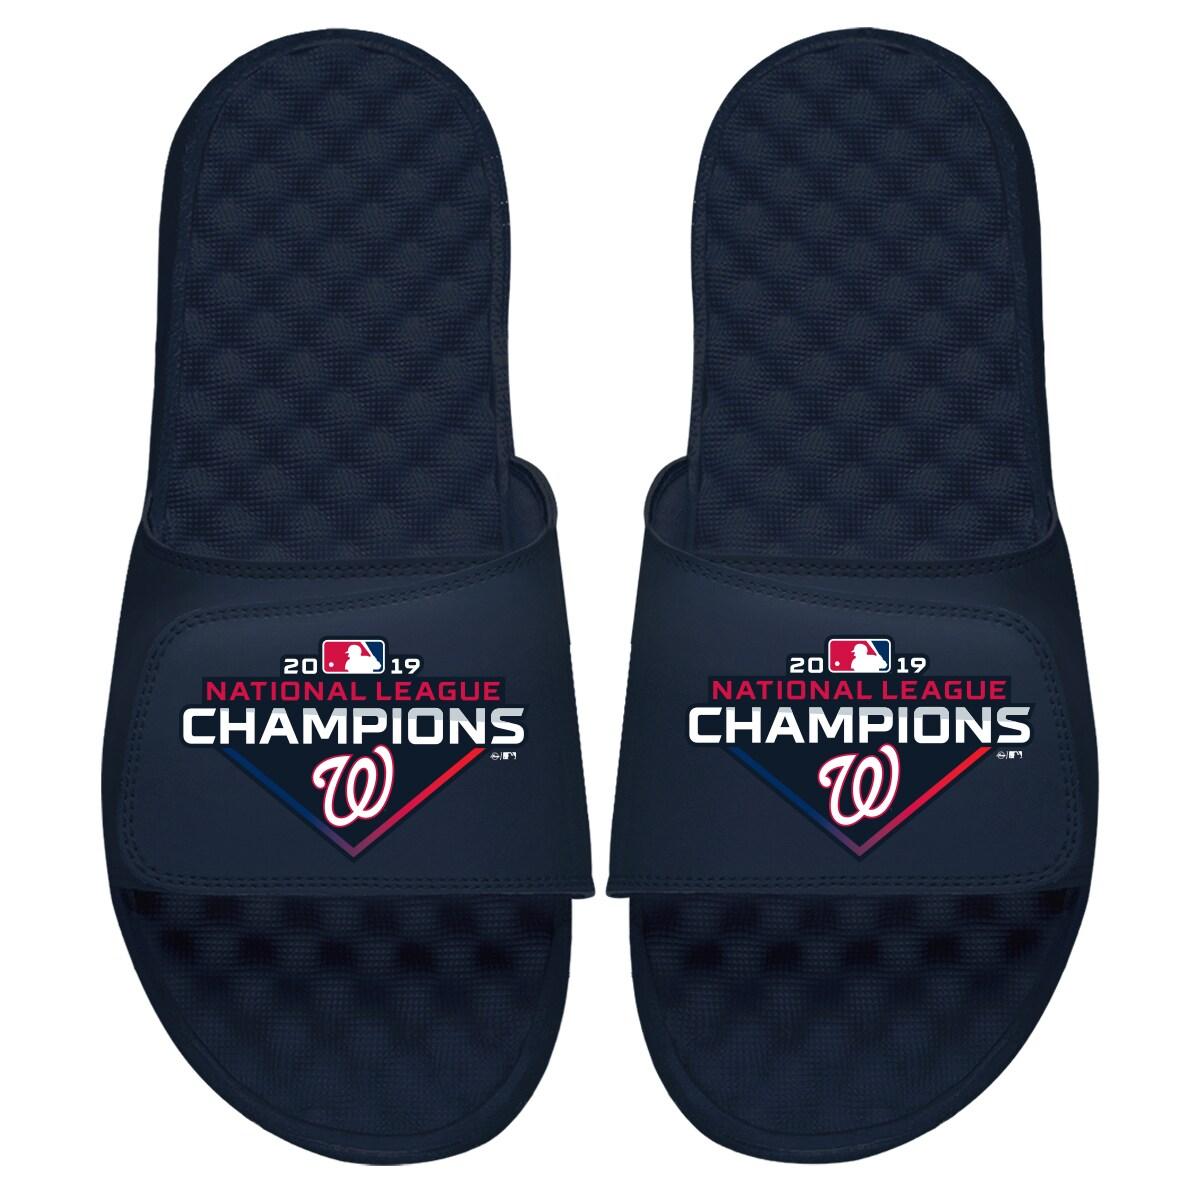 Washington Nationals ISlide 2019 National League Champions Slide Sandals - Navy